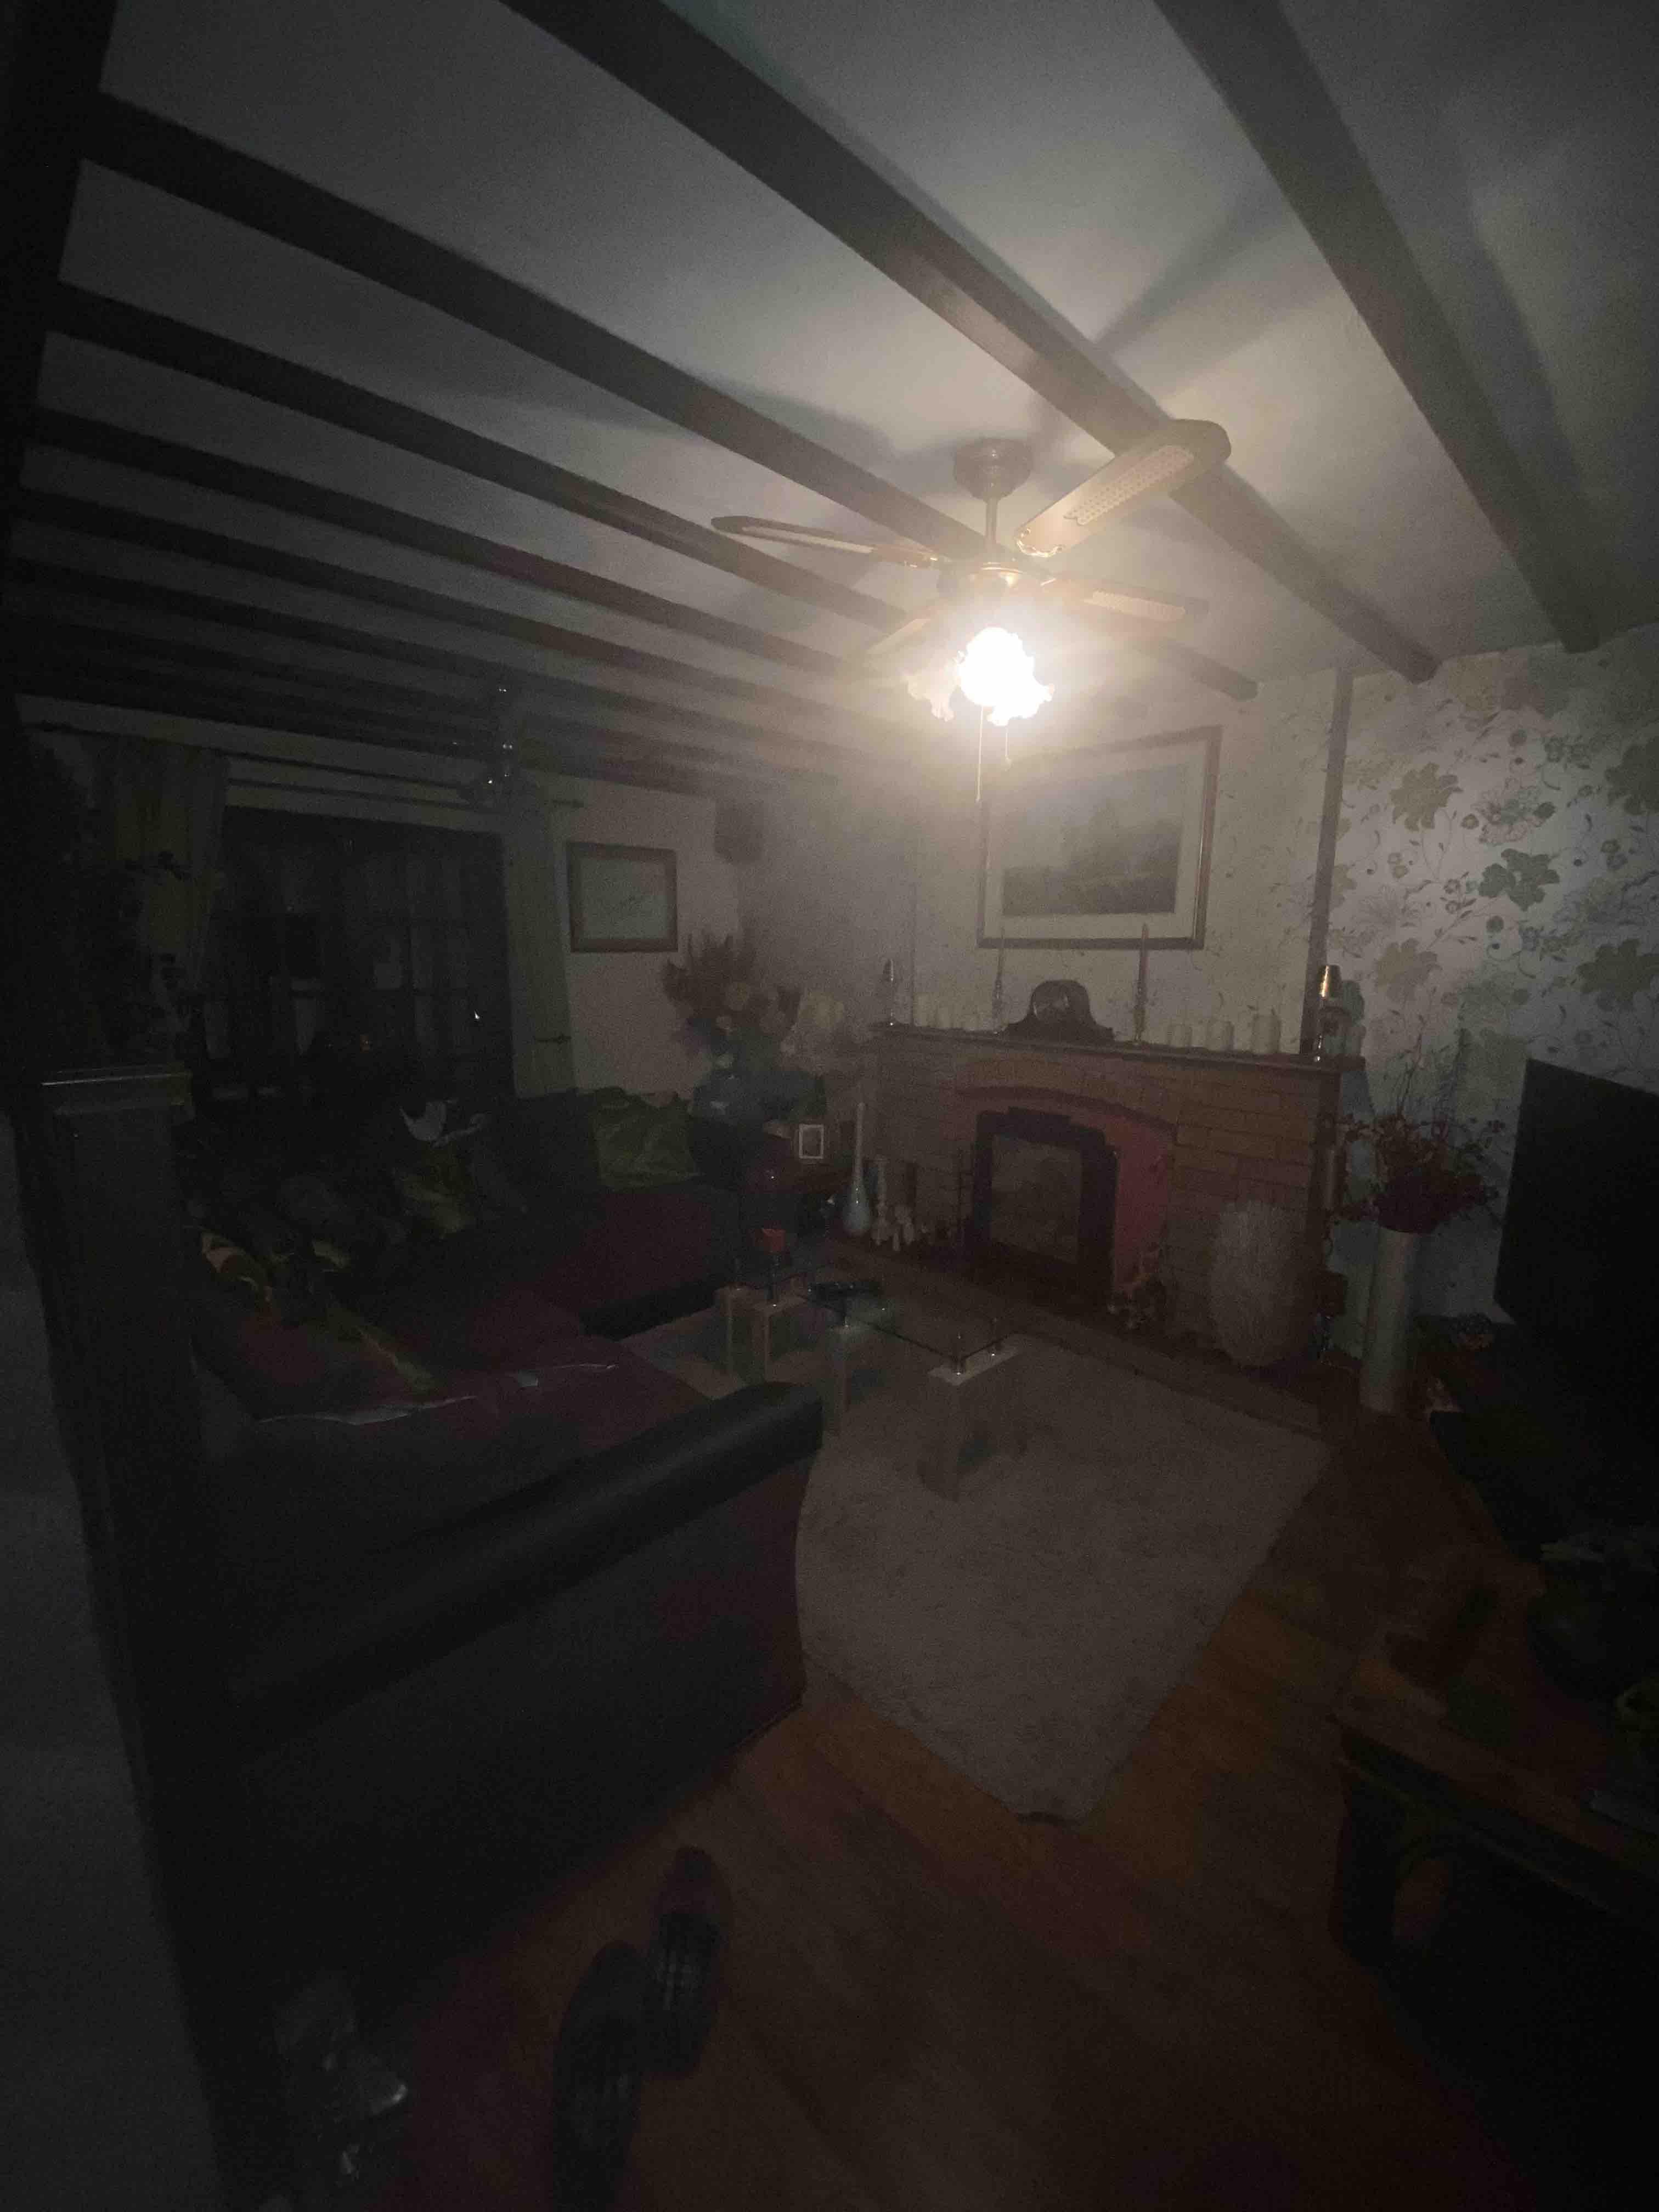 1 room in Earl Shilton, Earl Shilton, LE9 7EY RoomsLocal image